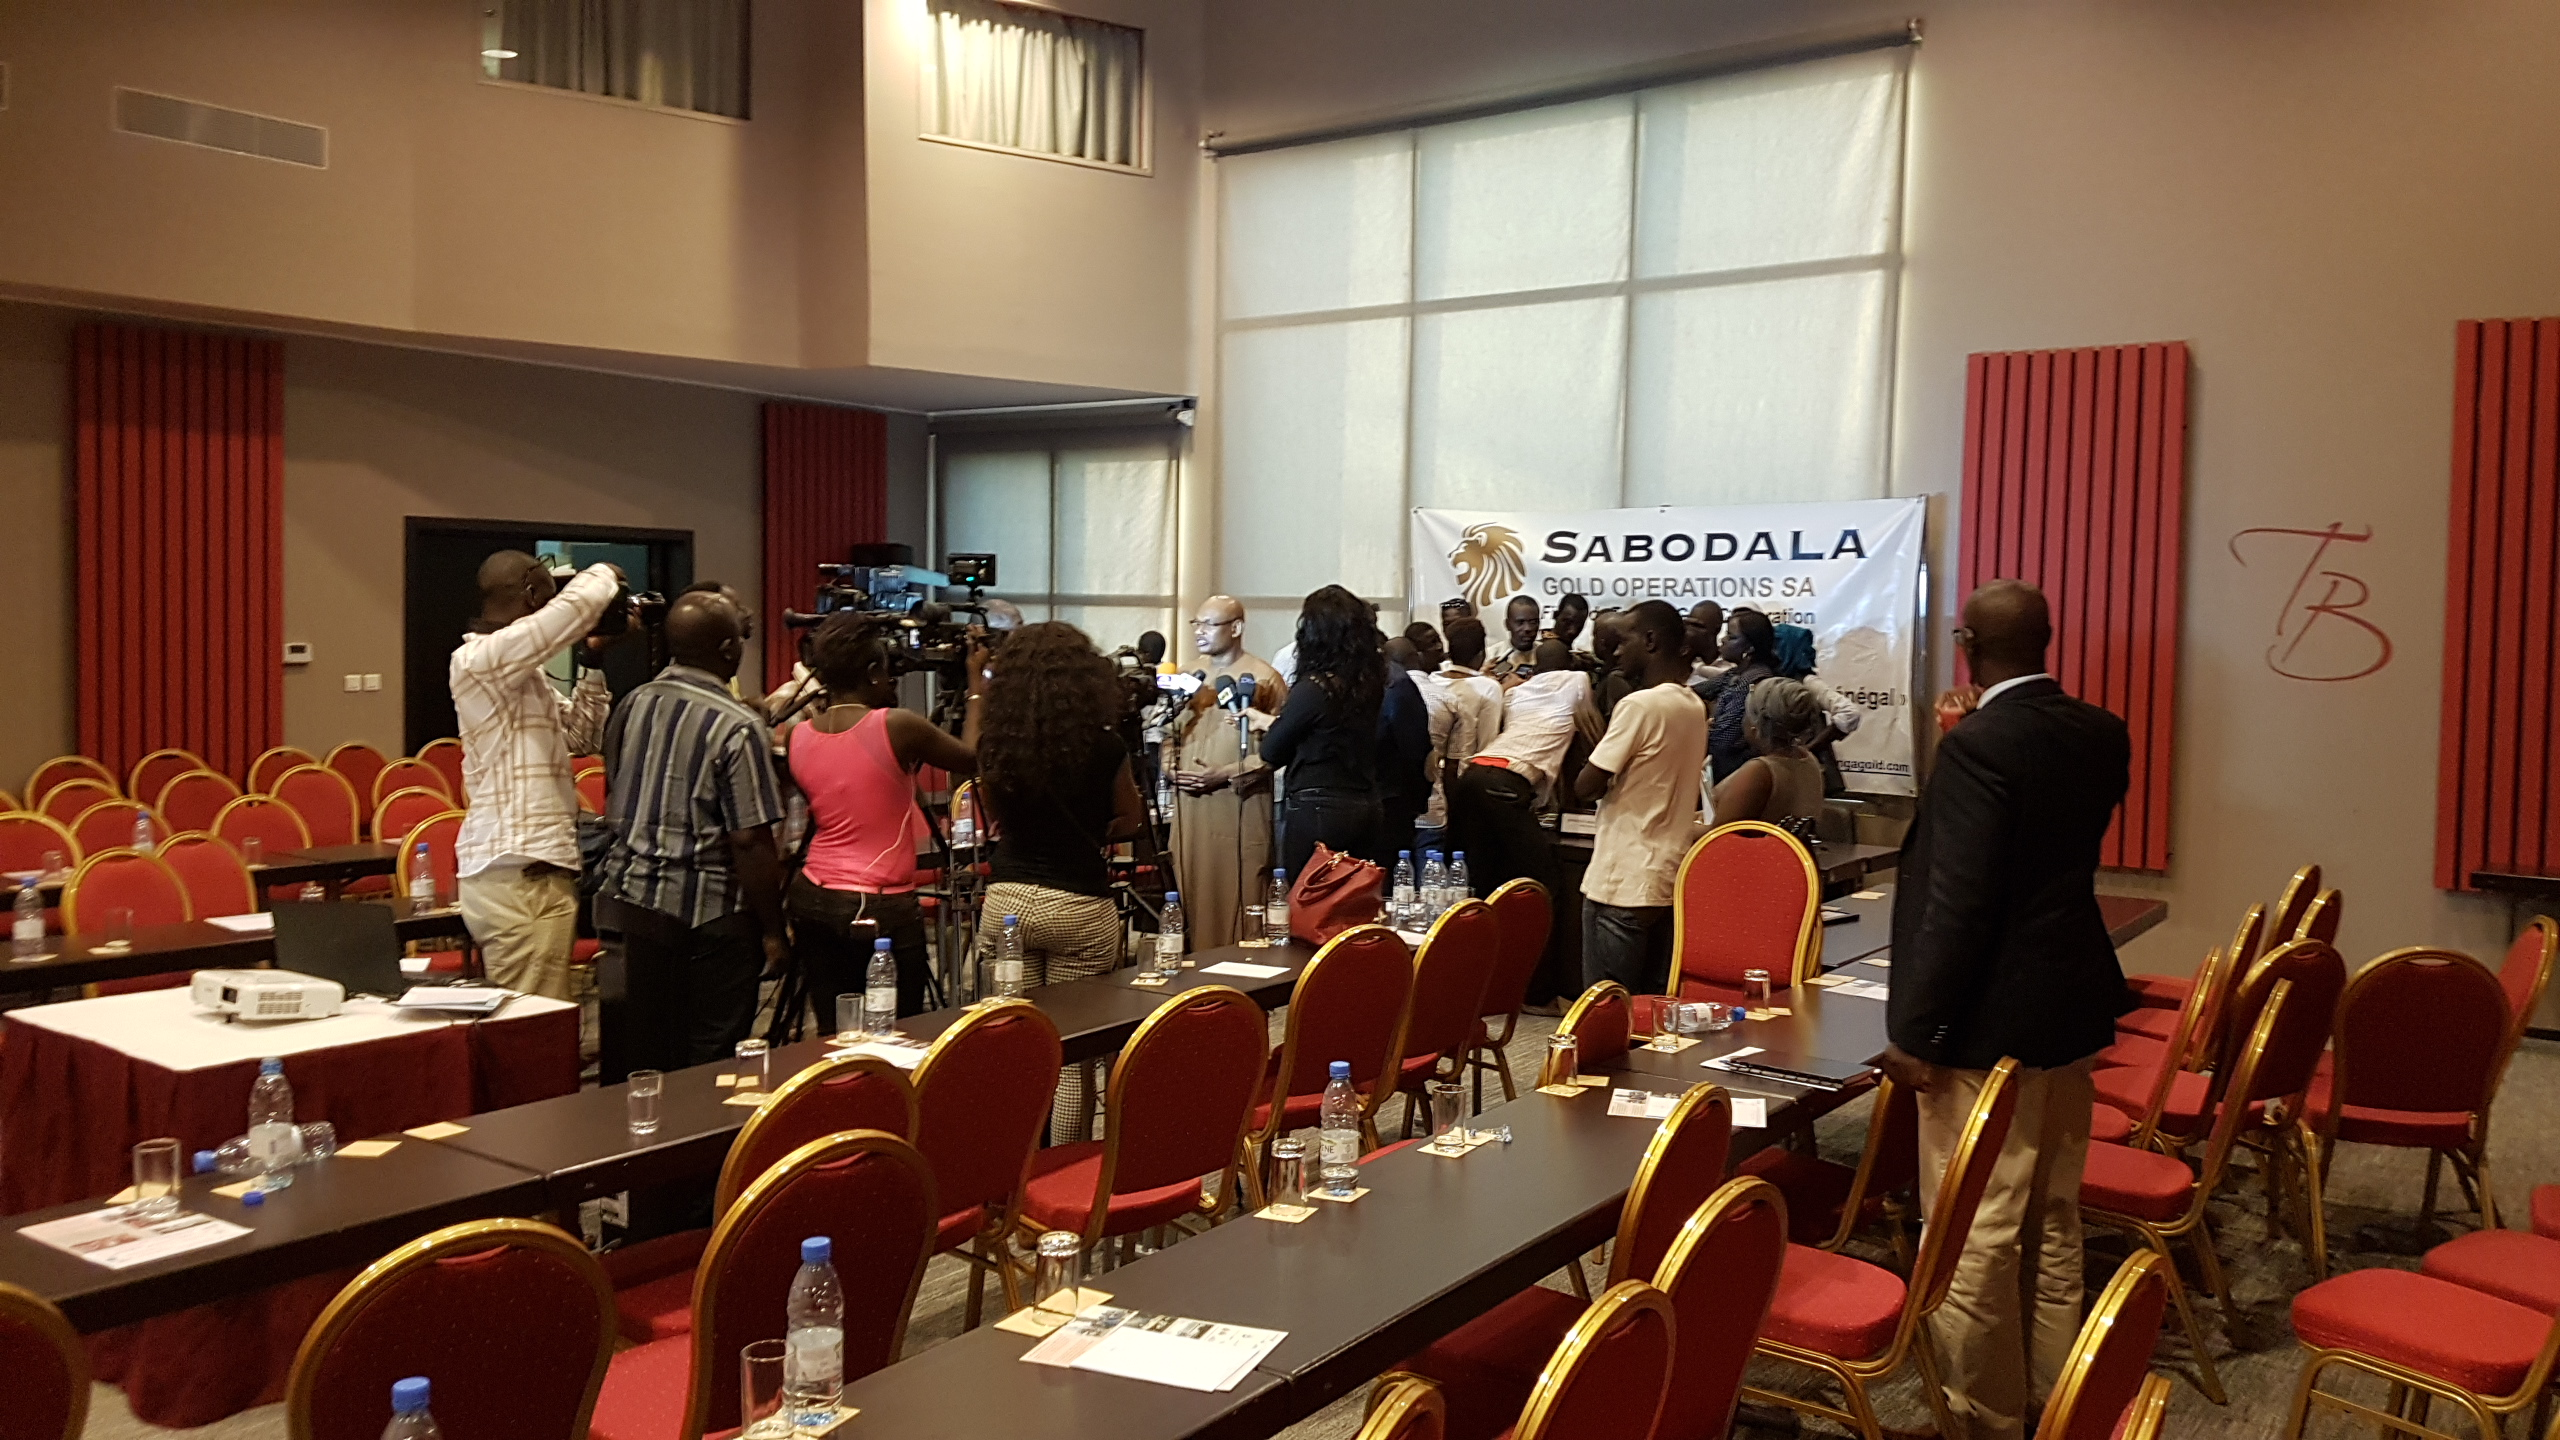 La société Sabadola Gold lourdement condamnée